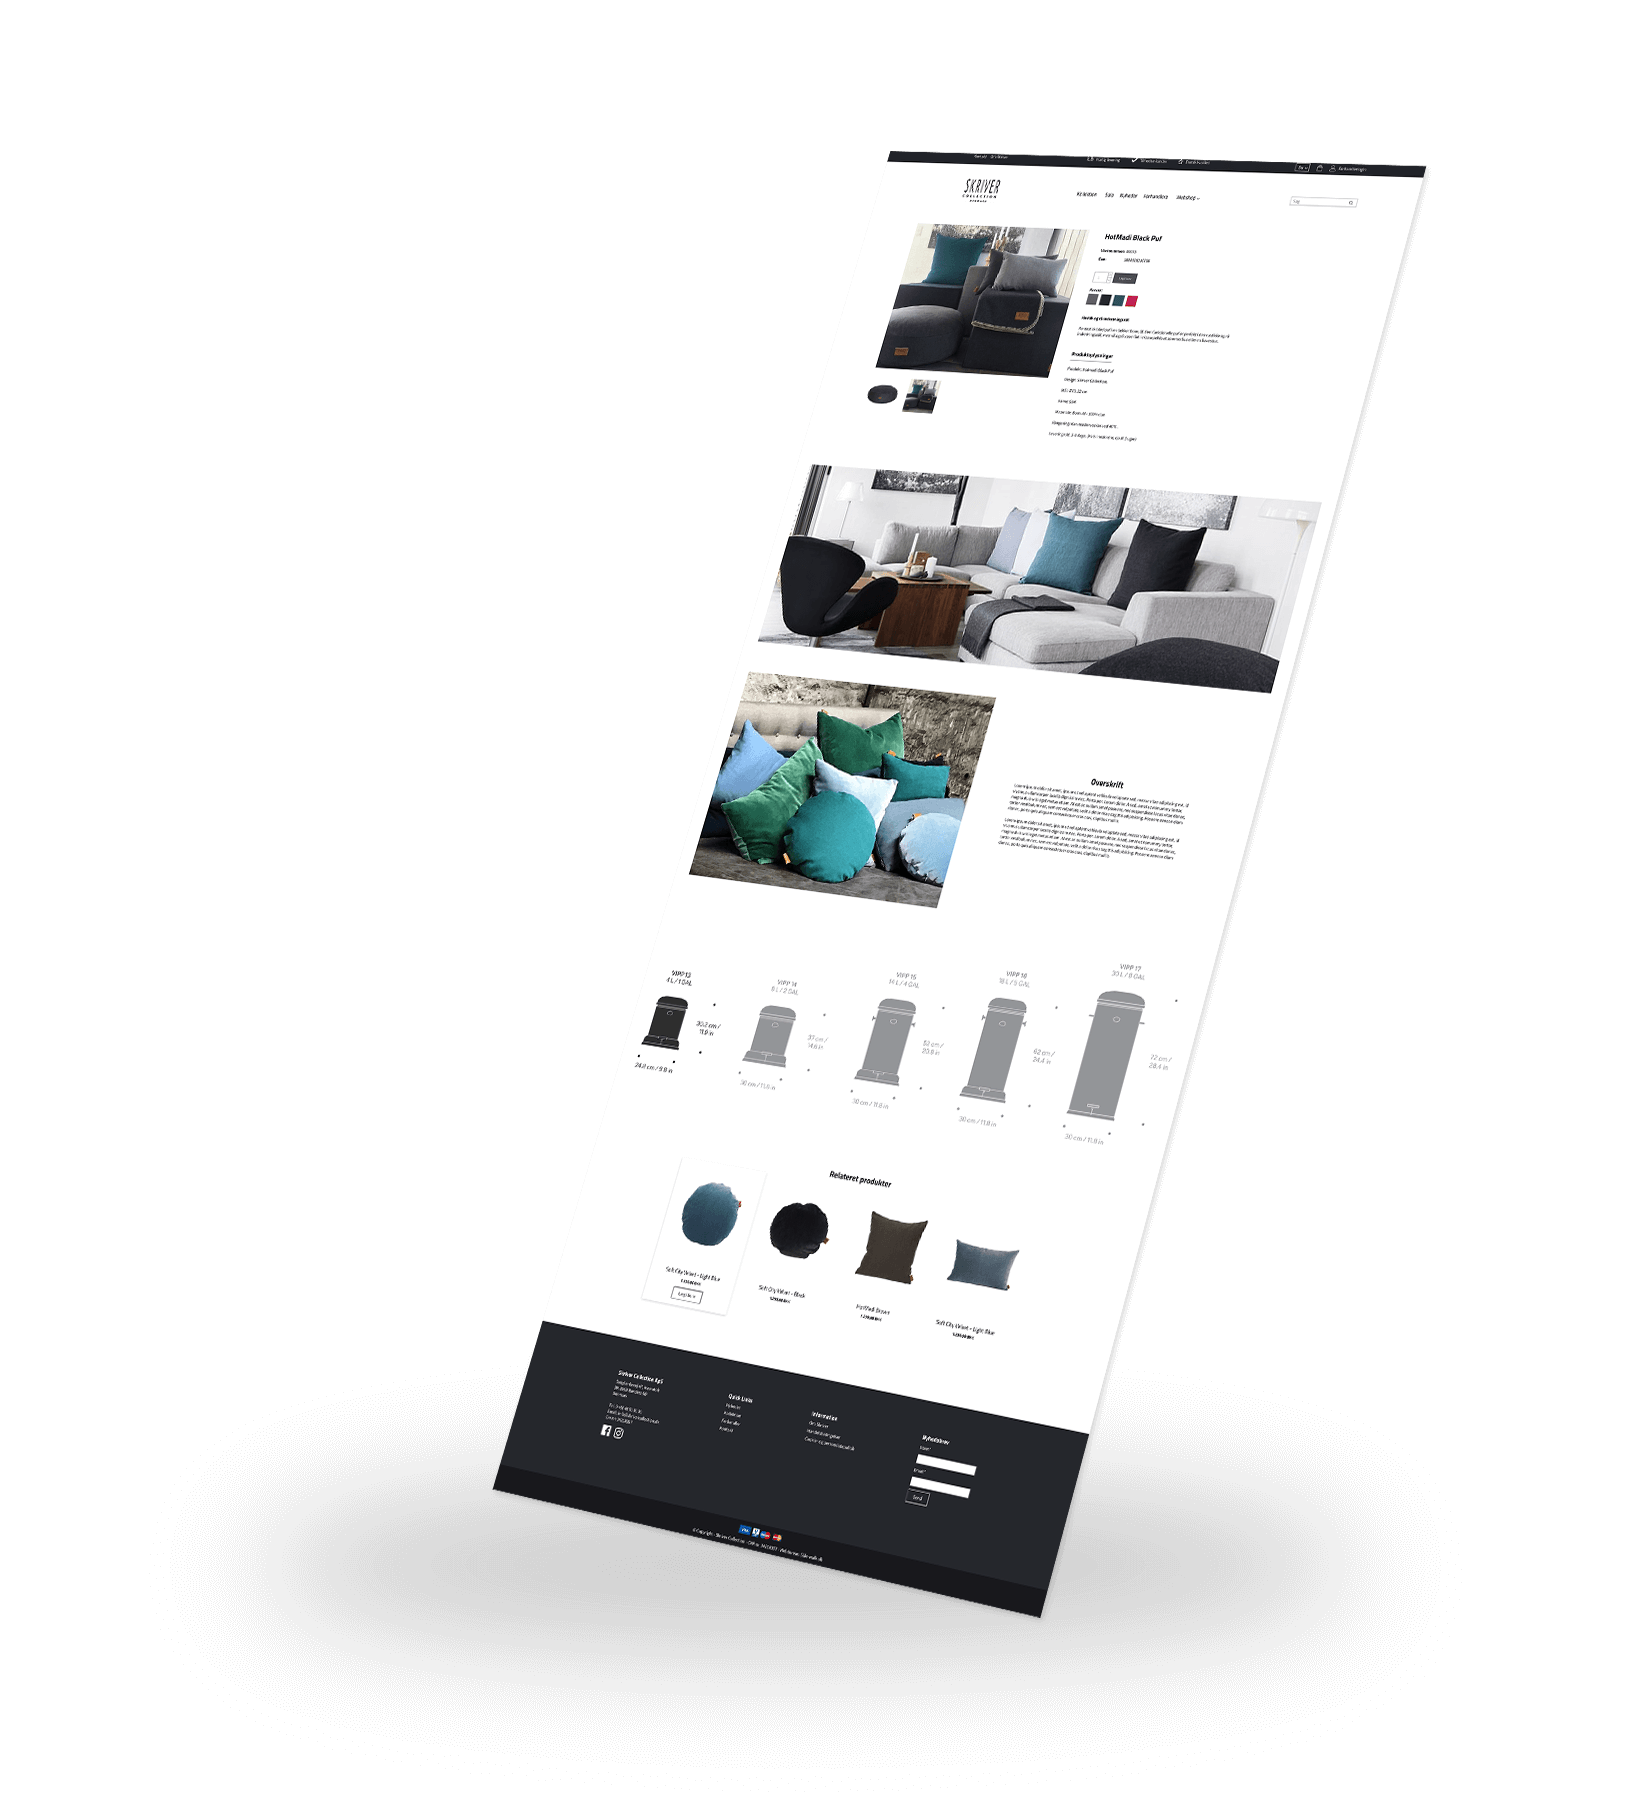 UX Design-SideWalk